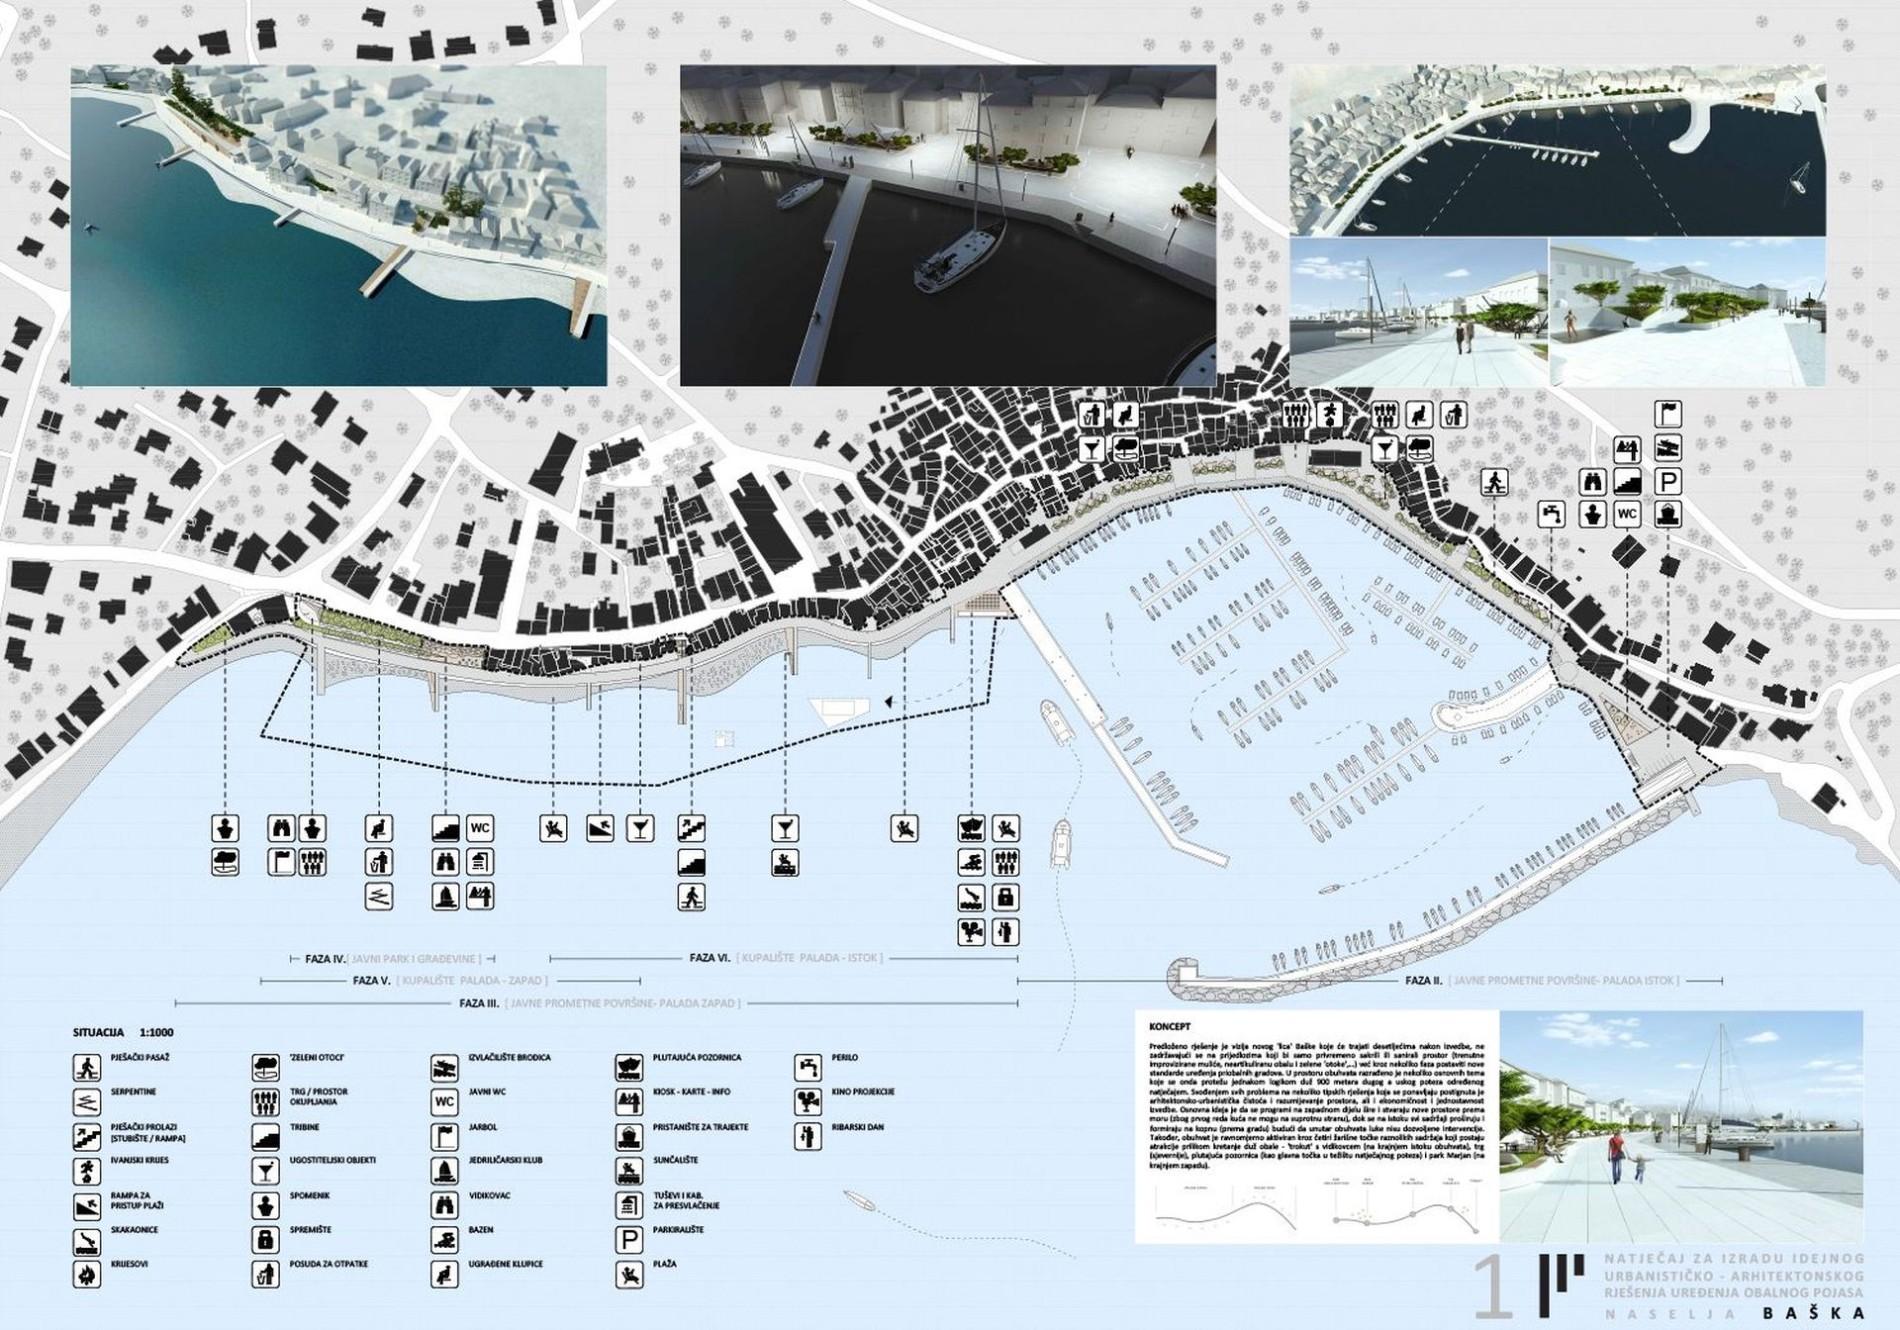 baška, krk, upi-2m, arhitektura, architecture, urban planning, urbanizam, hrvatska, croatia